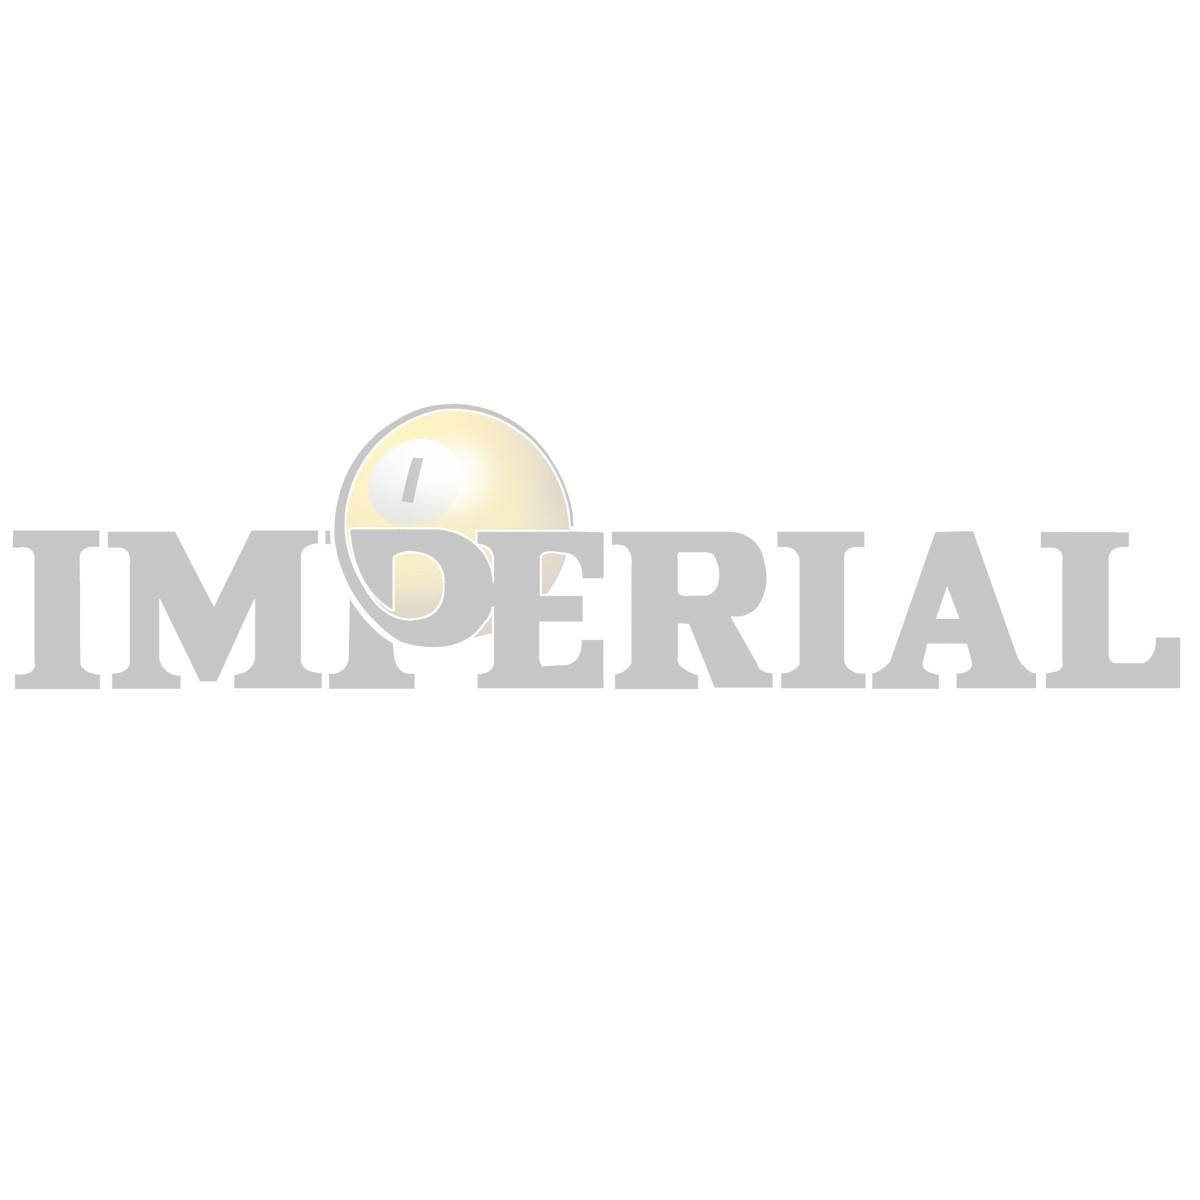 Minnesota Vikings Home vs. Away Billiard Ball Set